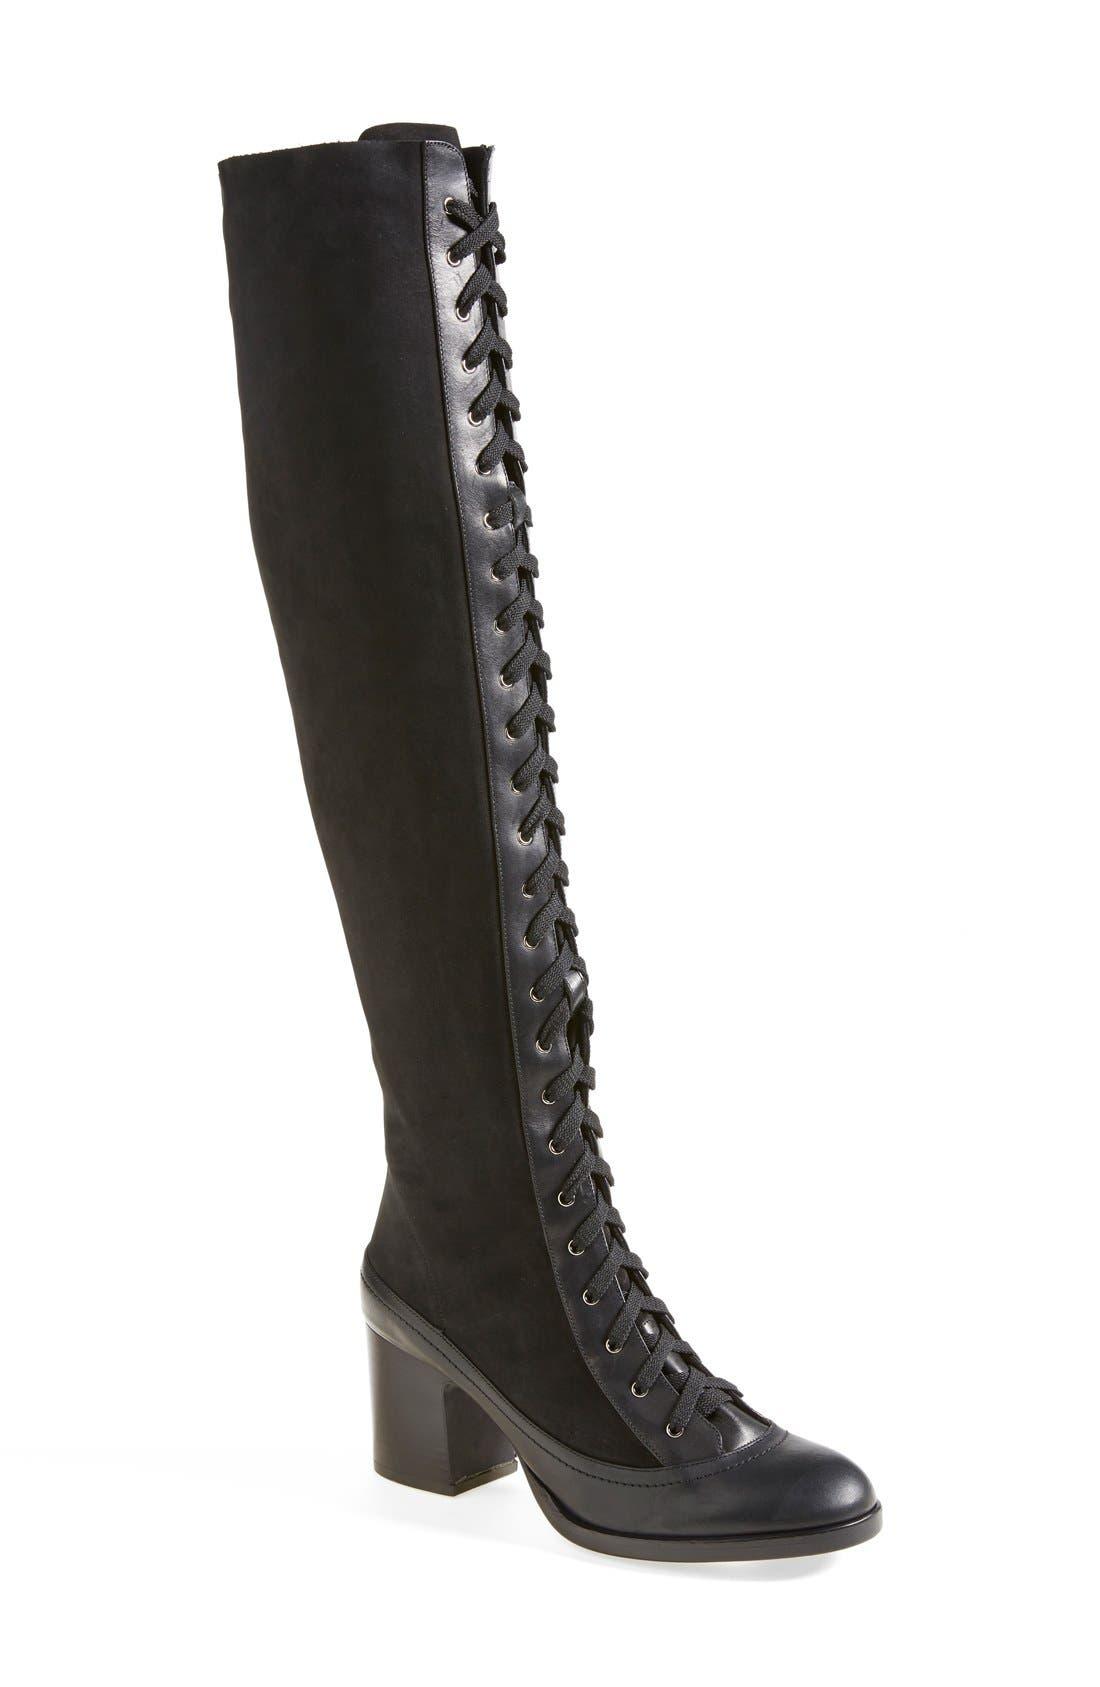 Main Image - Rag & Bone 'Acton' Knee High Boot (Women)